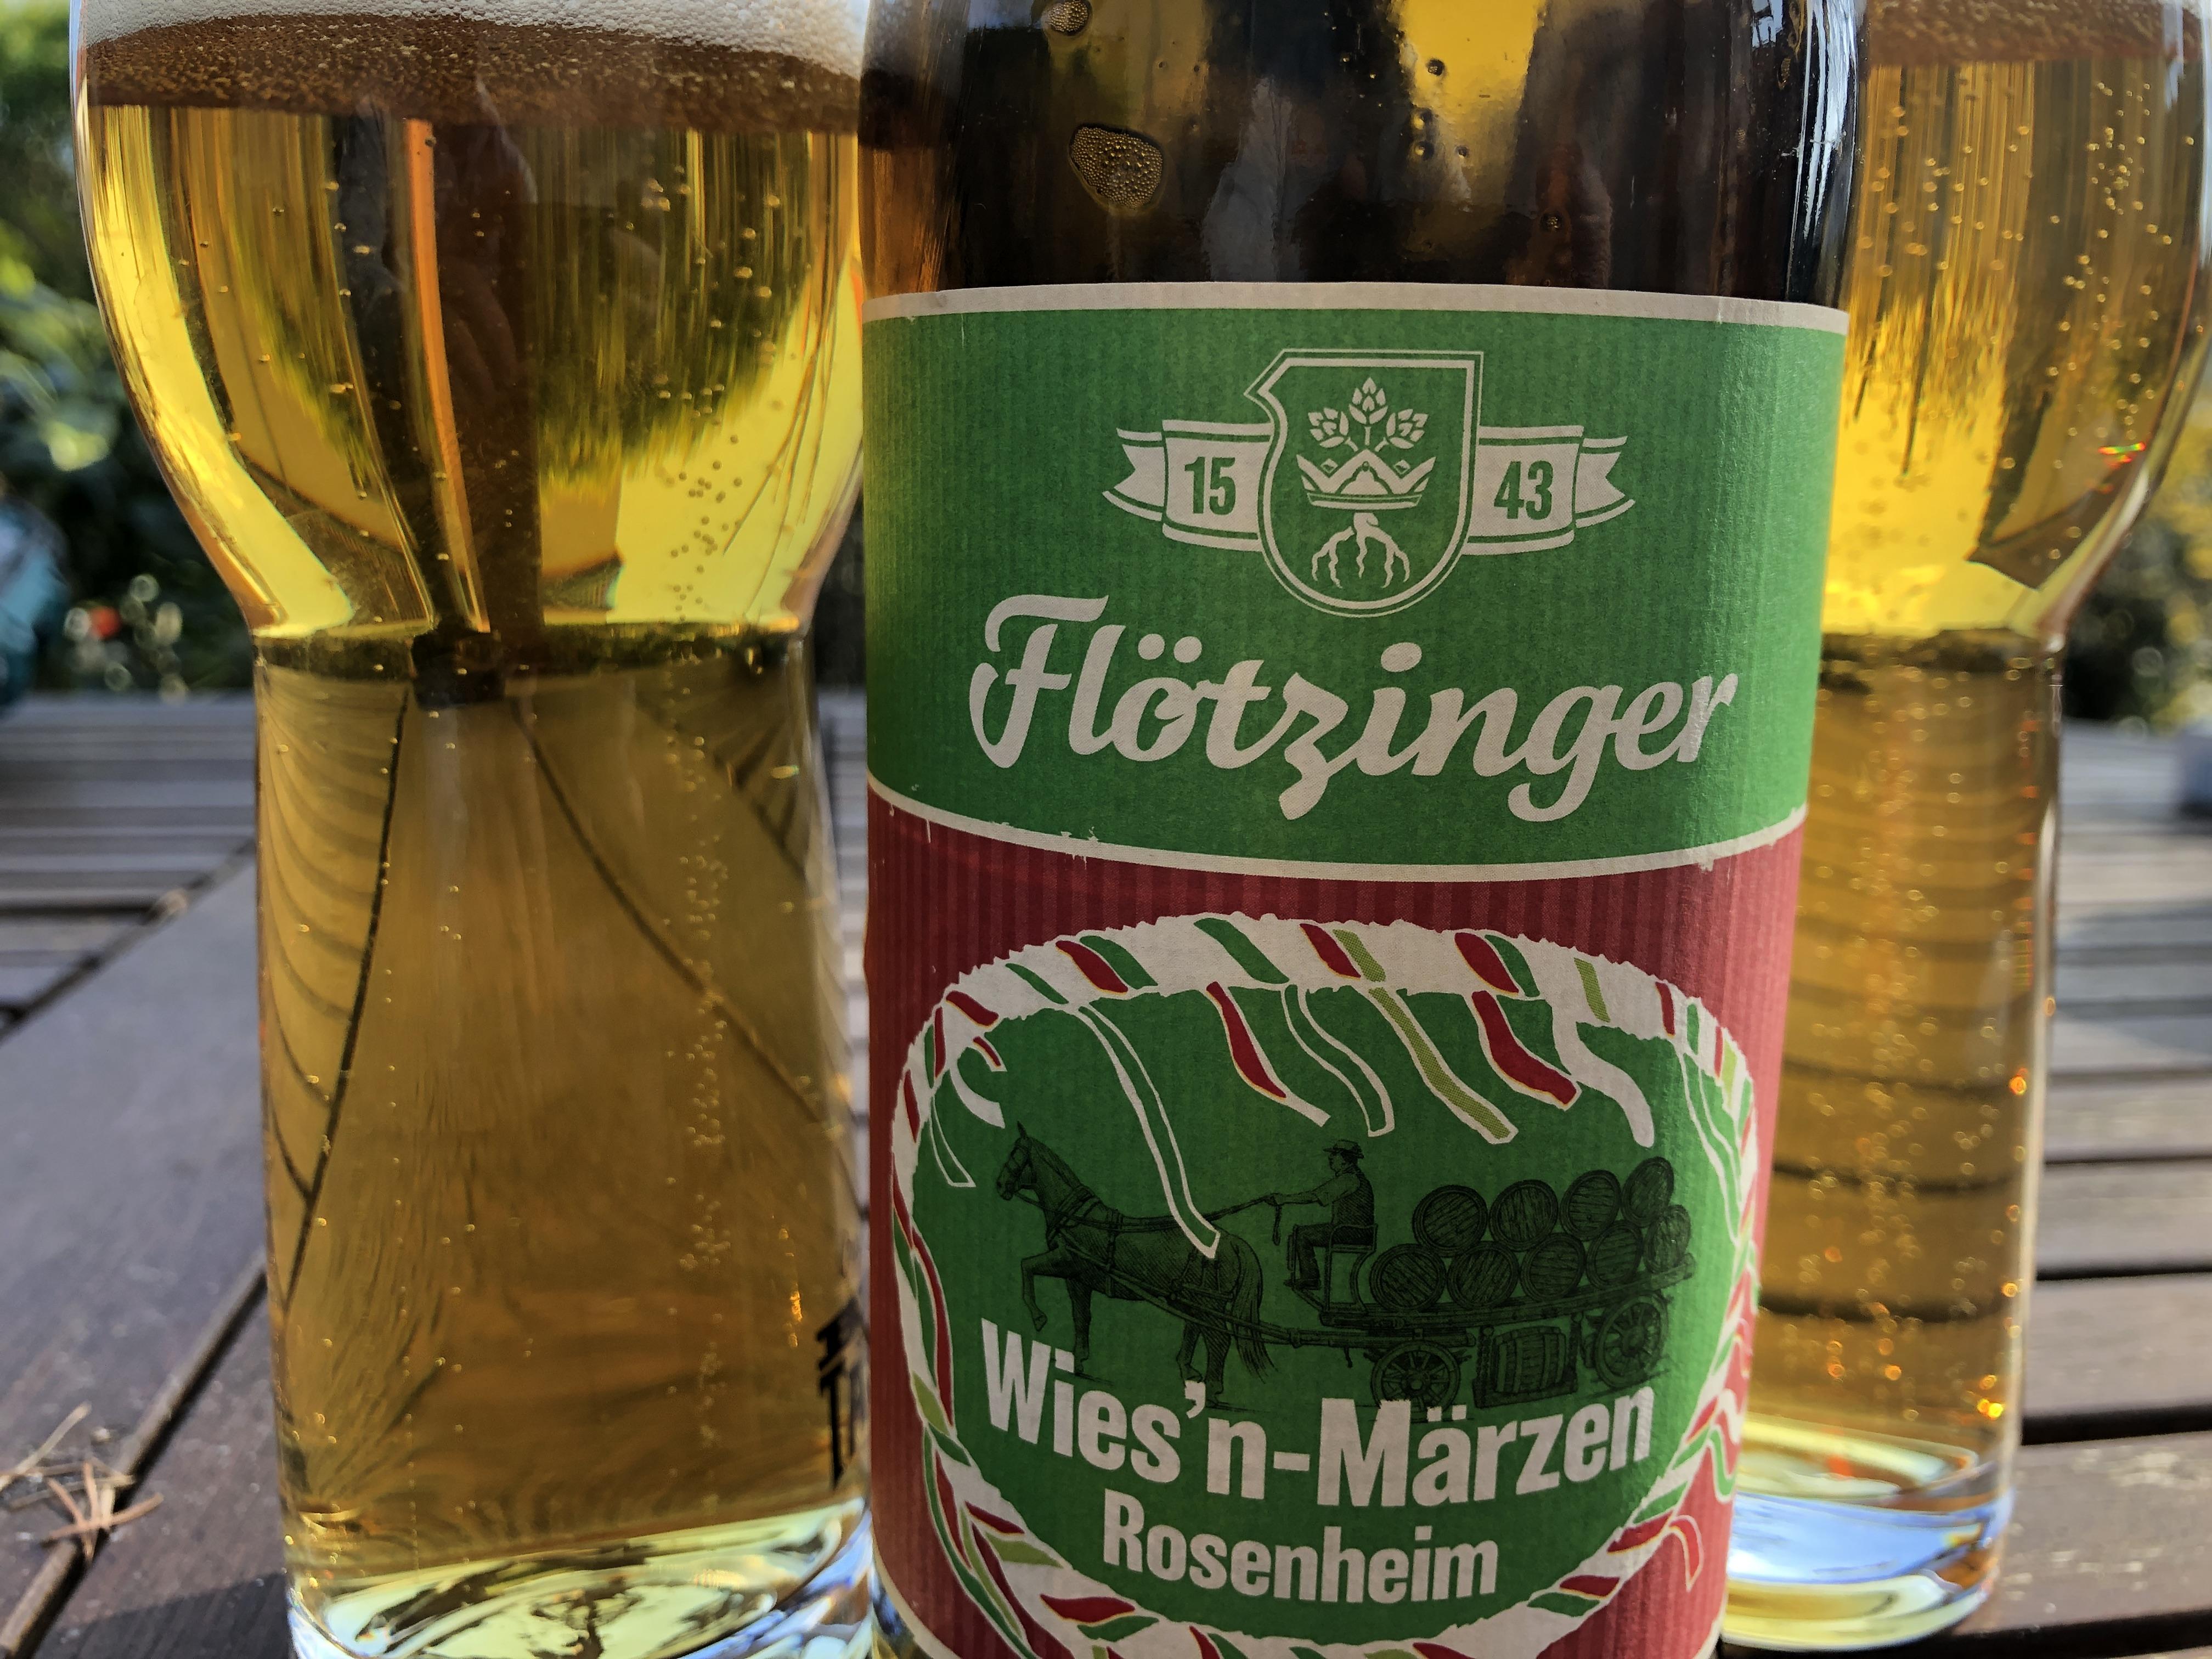 Flötzinger Wies'n-Märzen Rosenheim